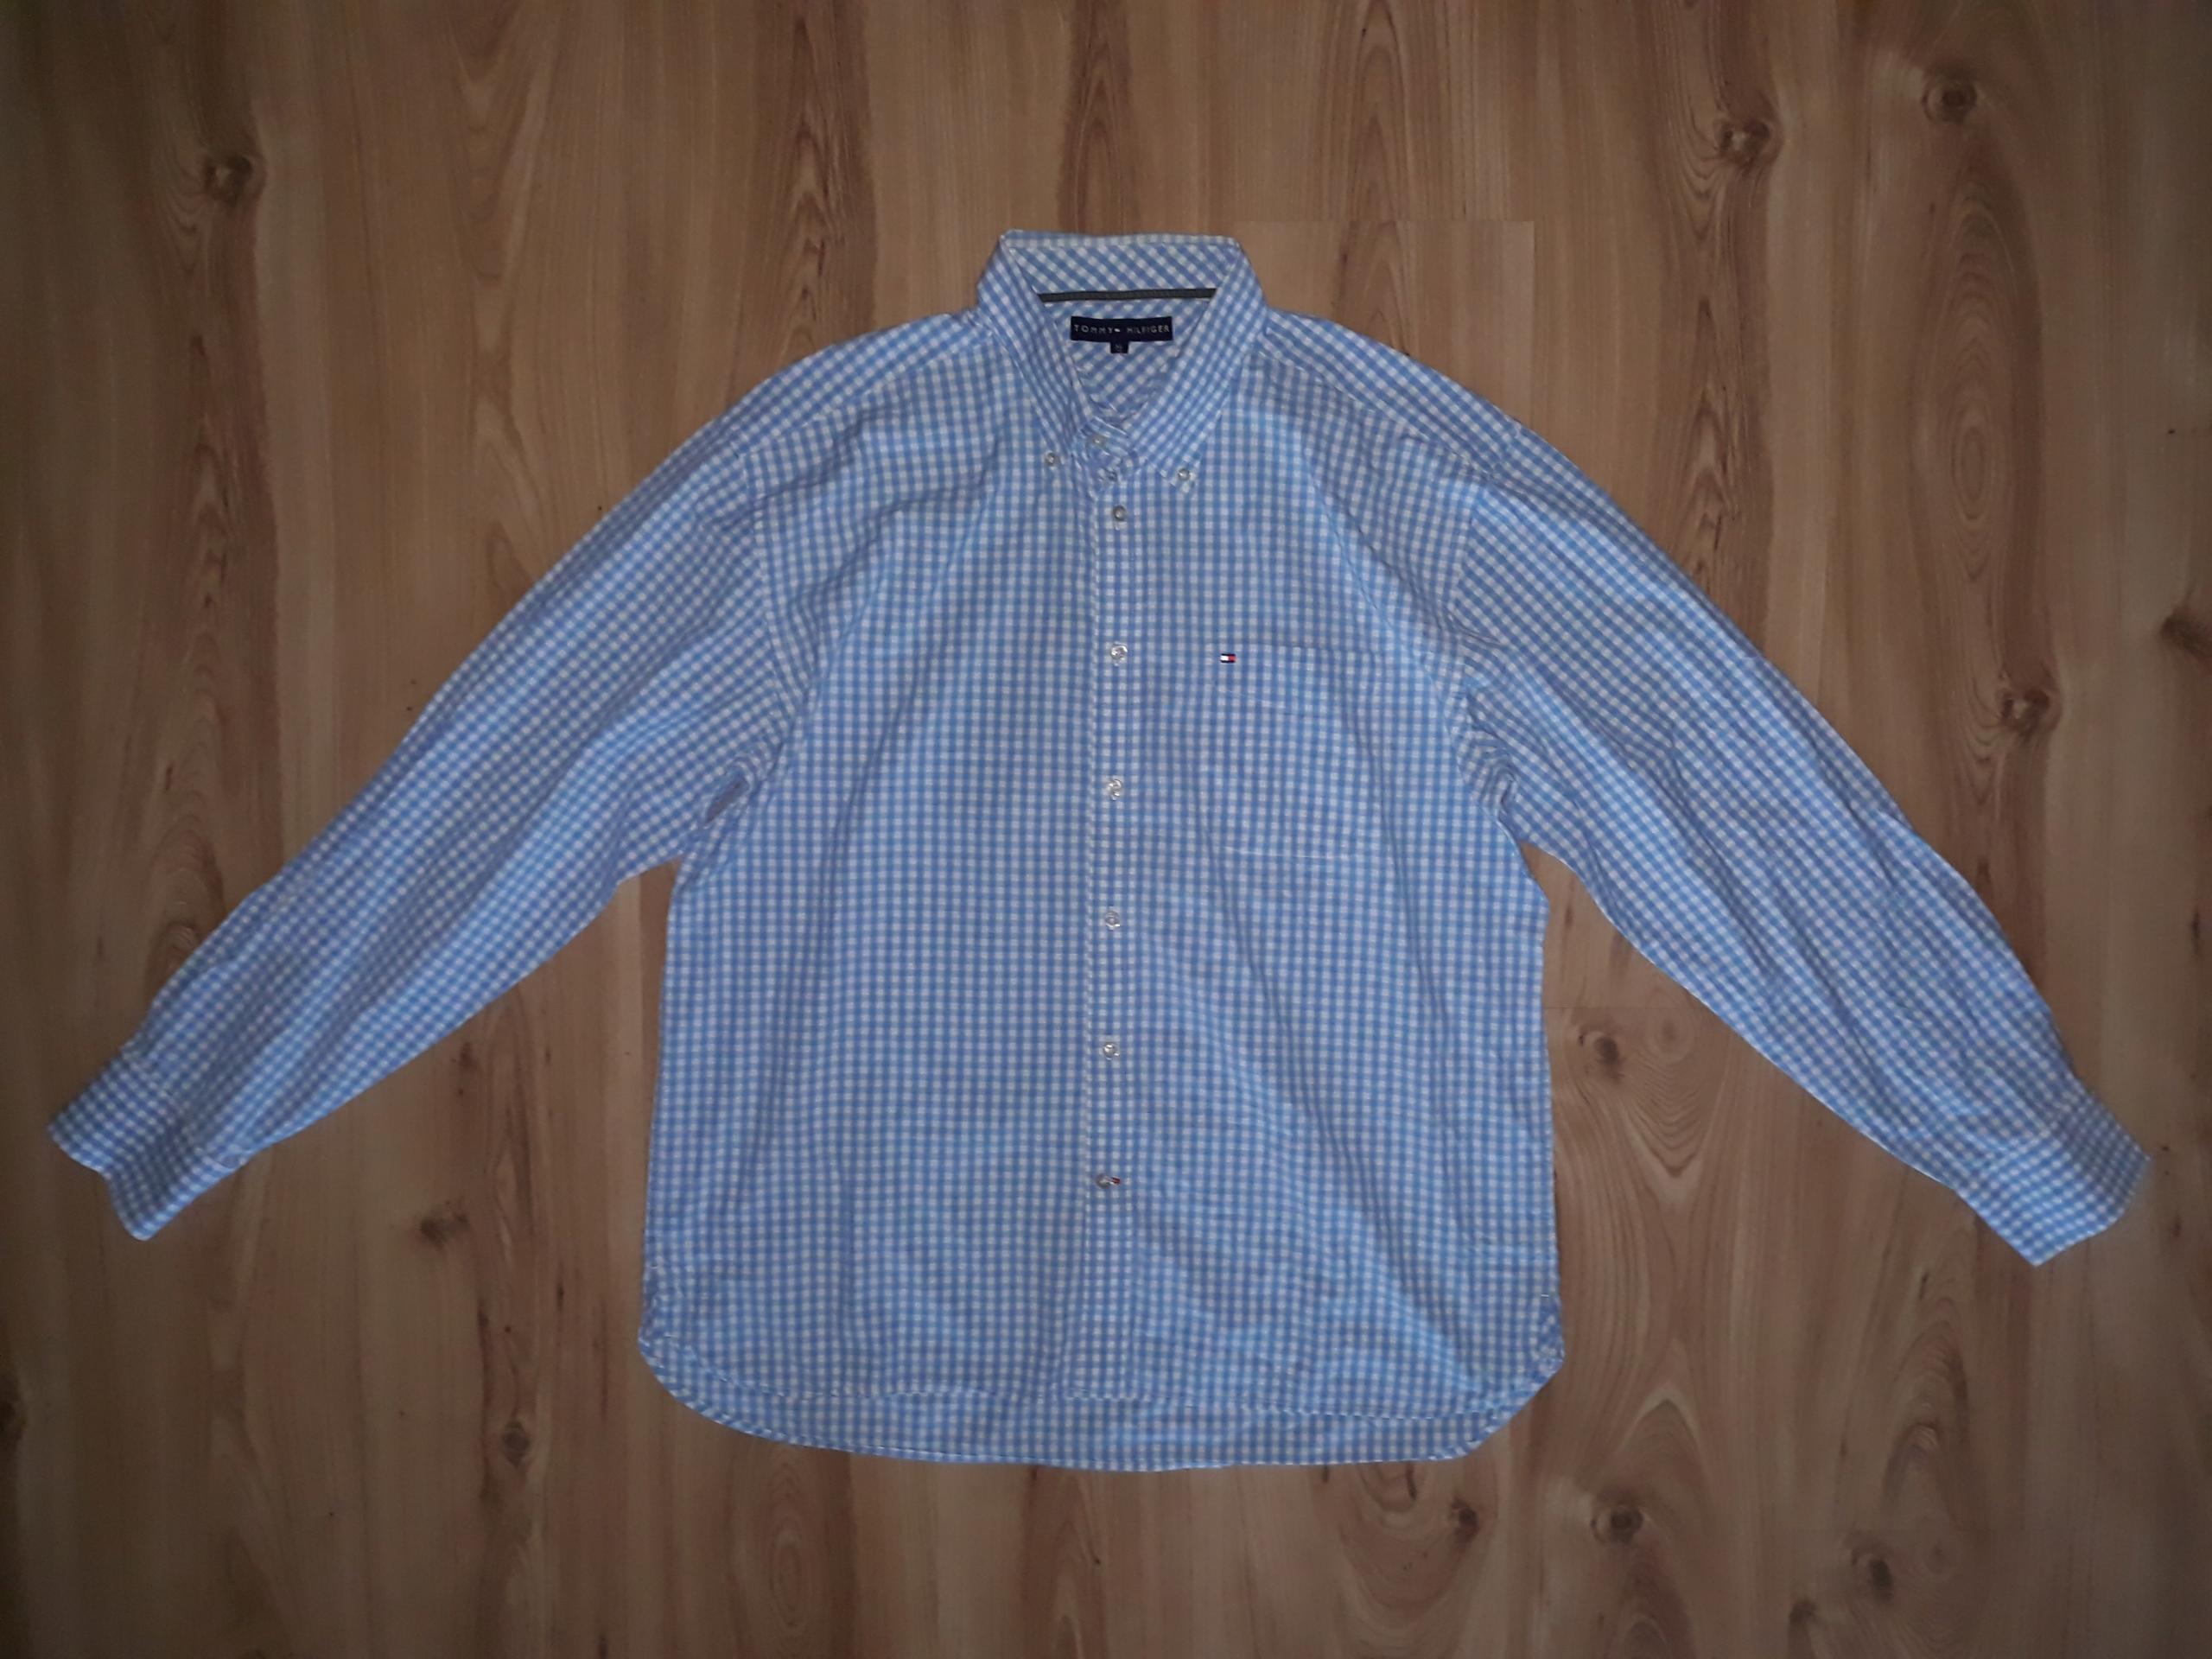 Koszula męska XL Tommy Hilfiger elegancka USA